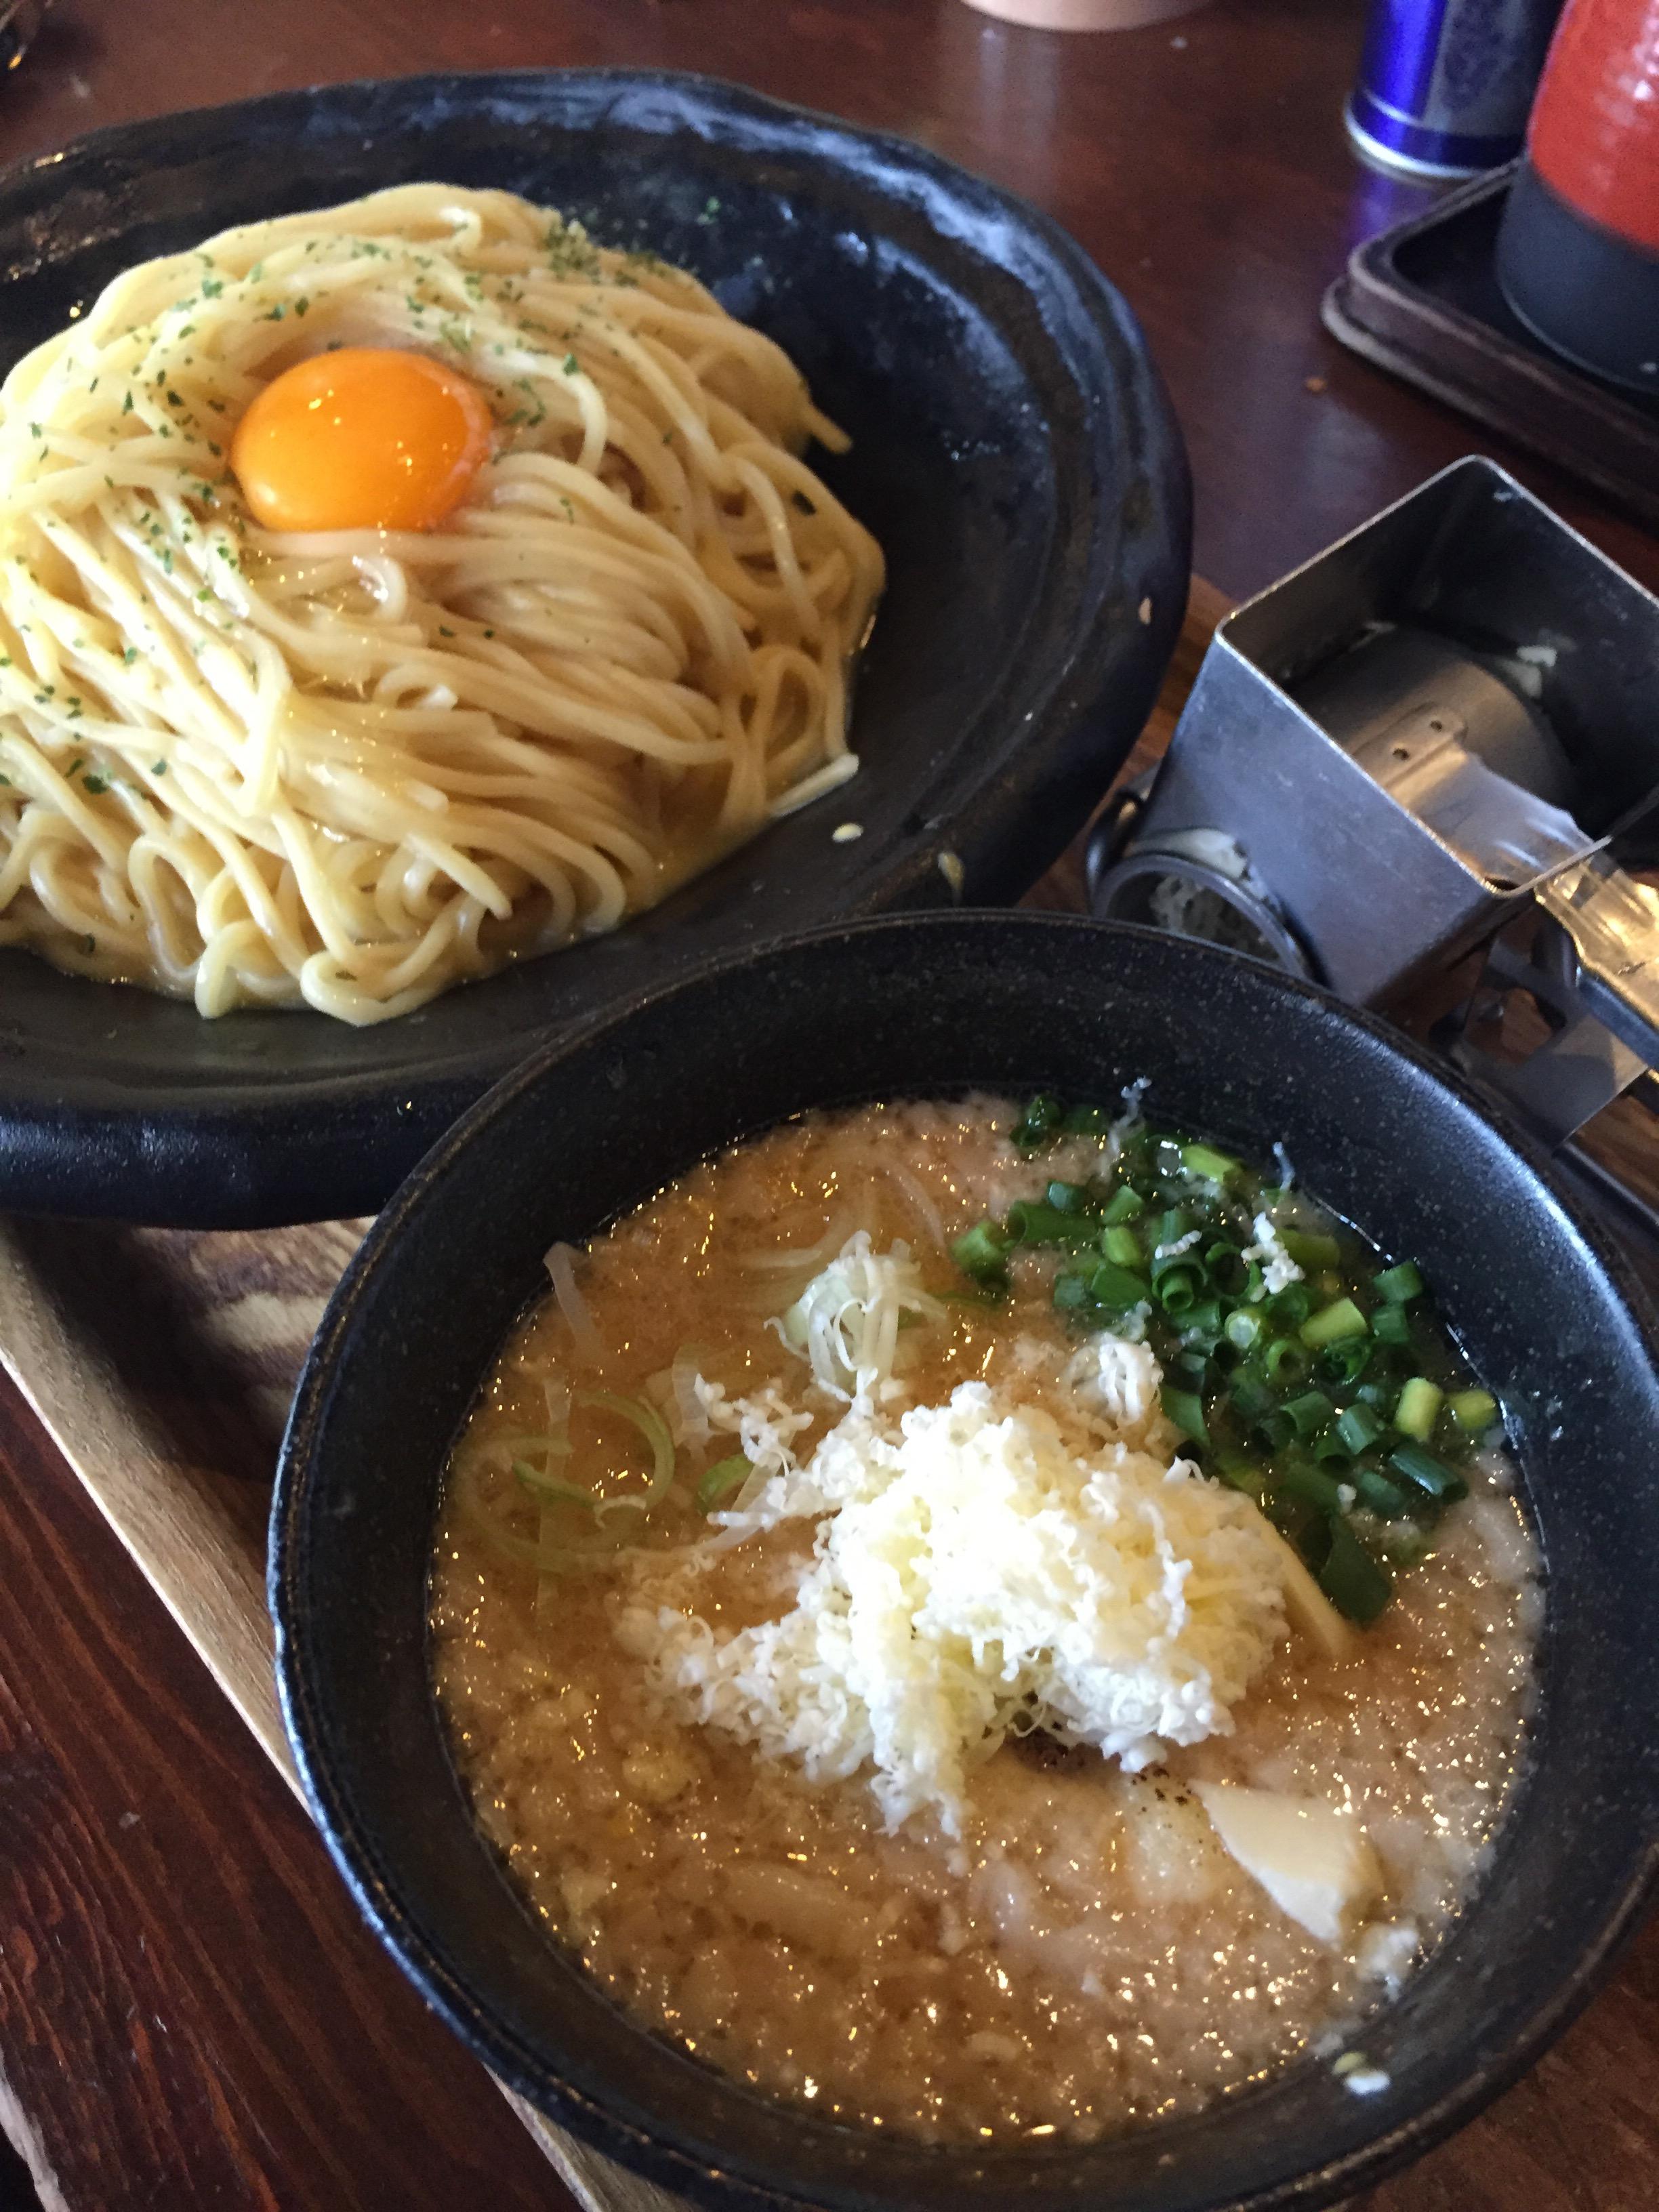 img 1013 【錦糸町ラーメン】七菜矢の豚チーズつけ麺が不思議美味♬